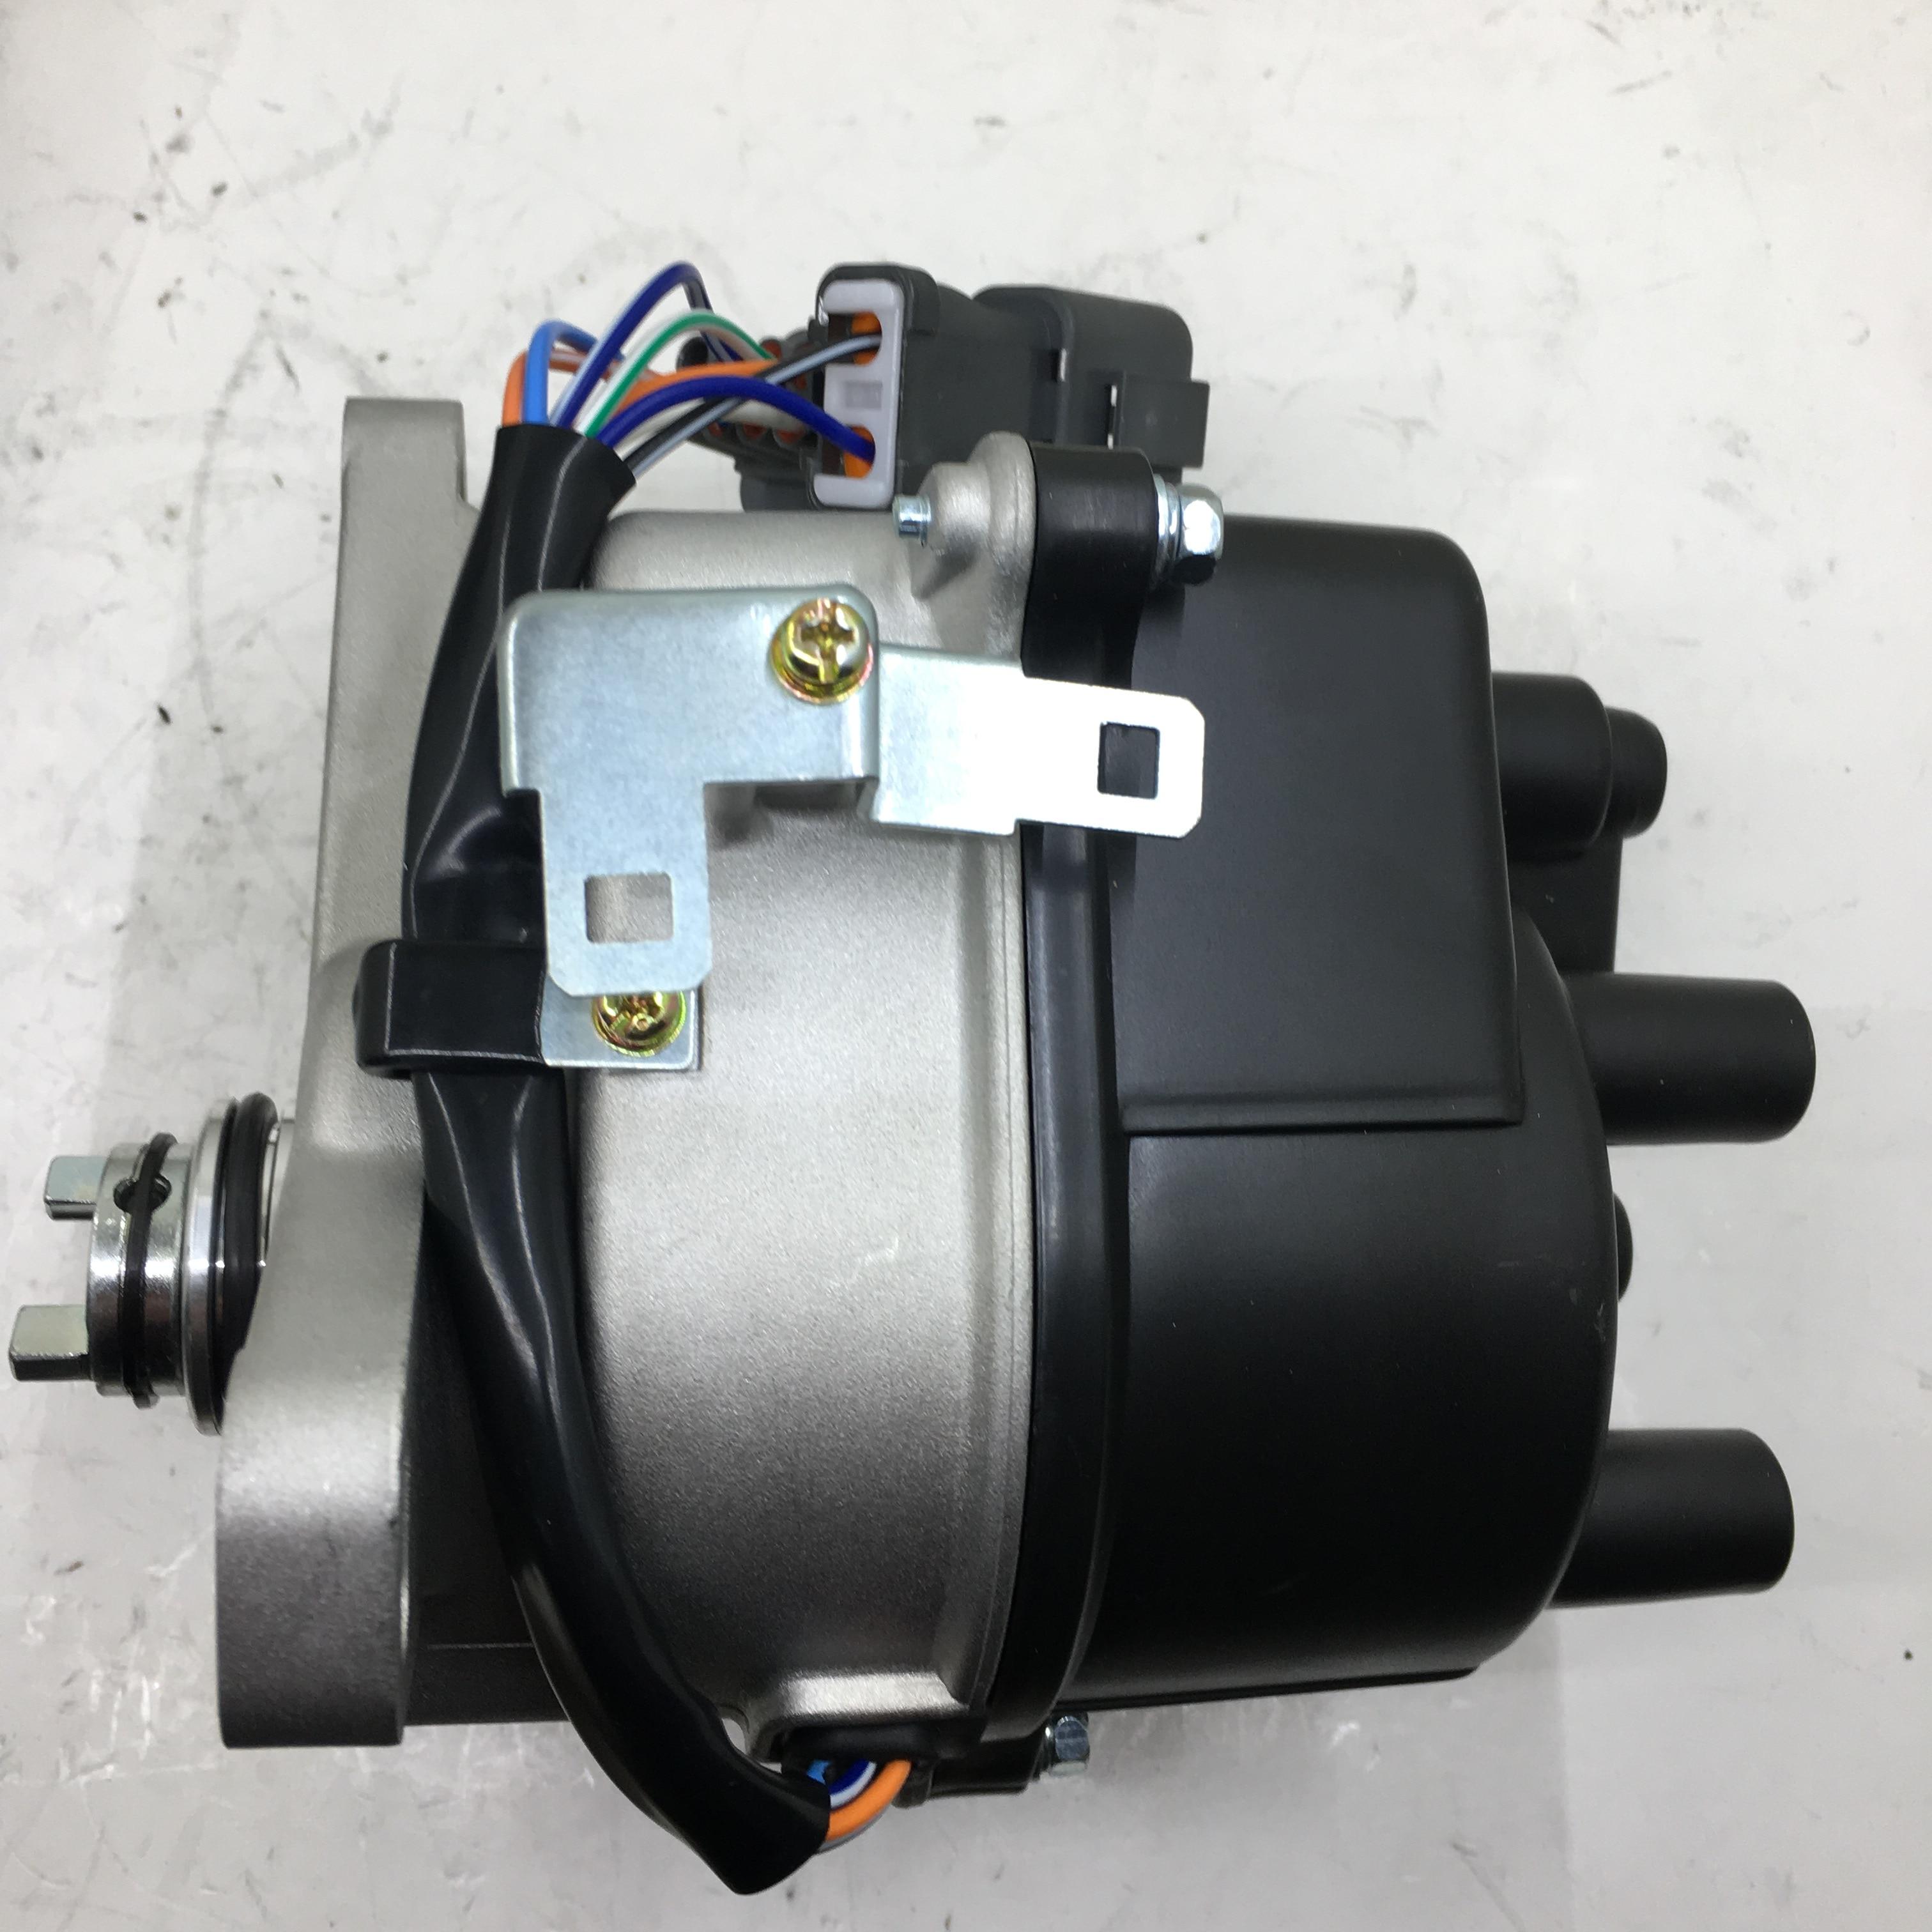 Distribuidor SherryBerg para Honda 92-96 preludio 2,2 H22A Vtec Dohc distribuidor de encendido Td-60U ensamblado eléctrico TD60U TD50U